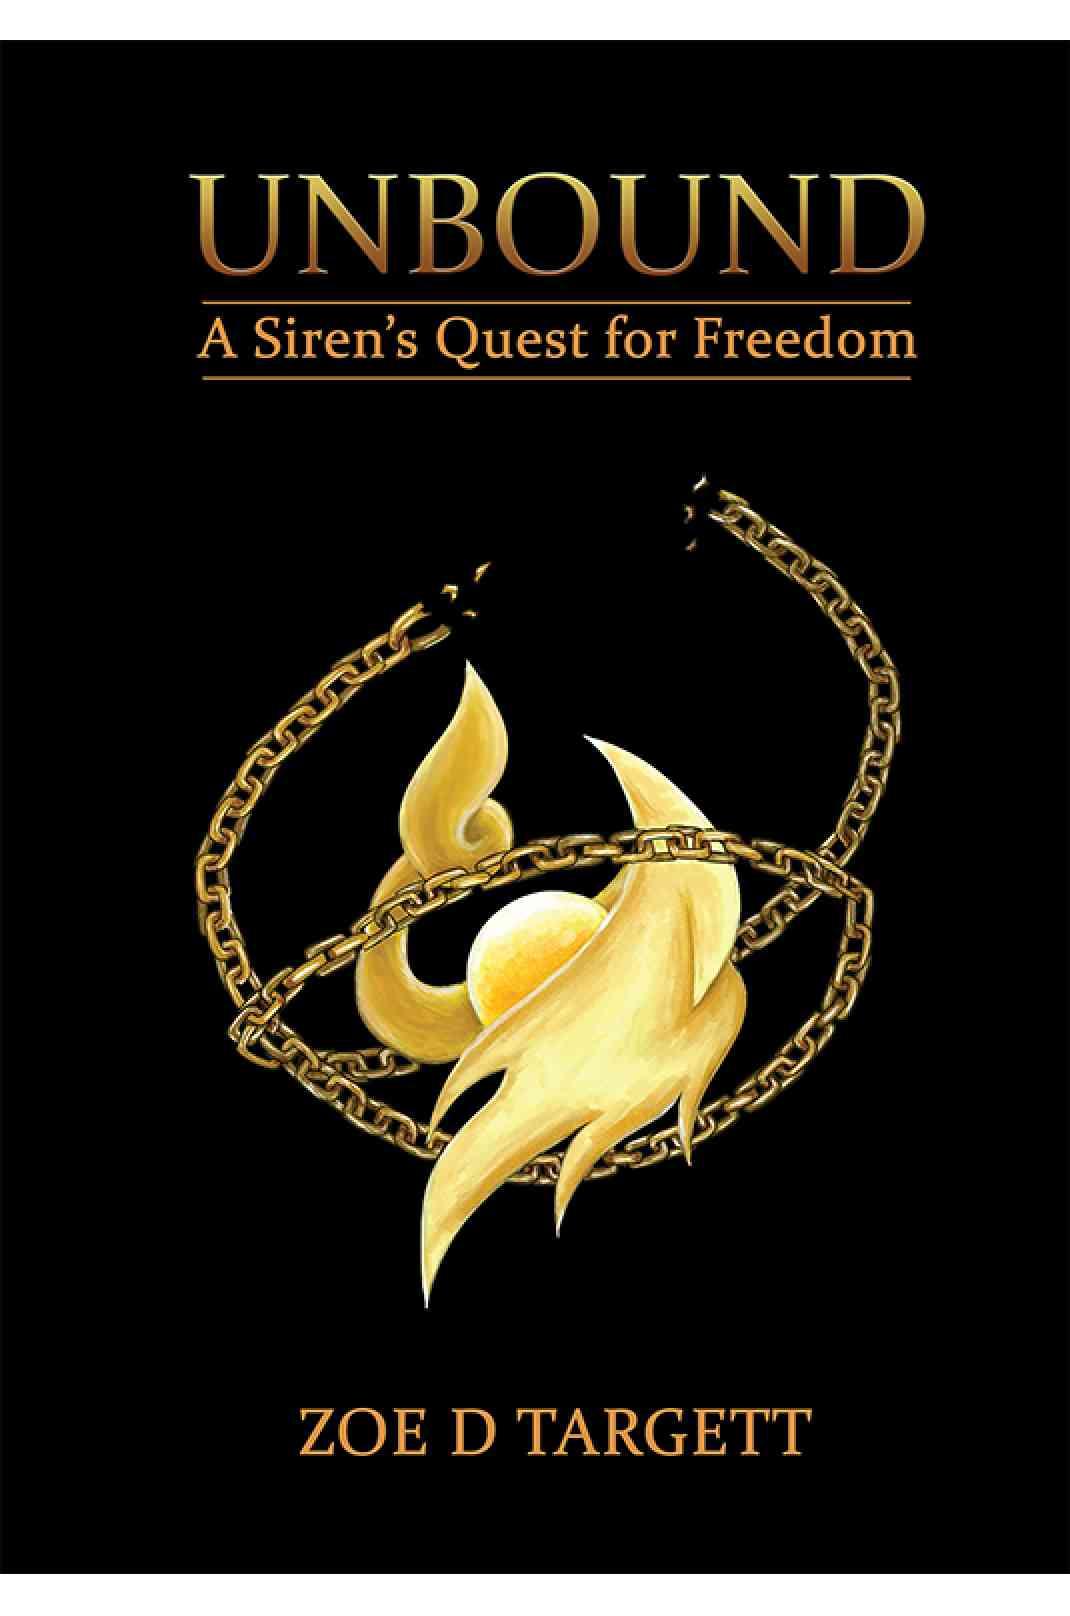 Unbound: A Siren's Quest for Freedom | Book| Austin Macauley